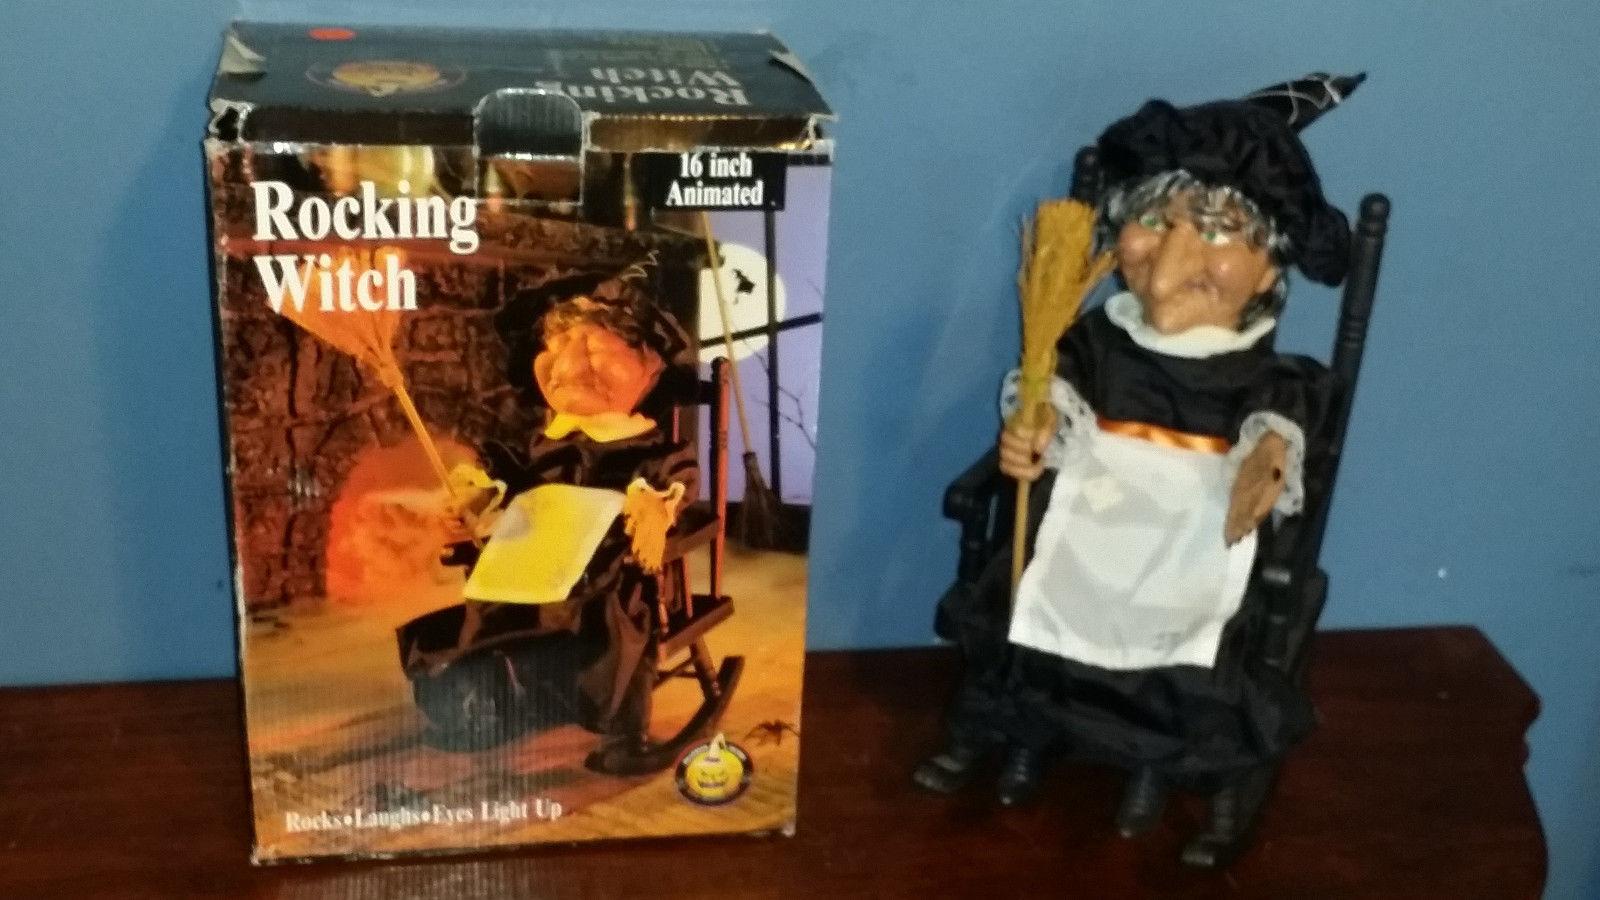 Tremendous Rocking Witch Animatronic Wiki Fandom Powered By Wikia Bralicious Painted Fabric Chair Ideas Braliciousco